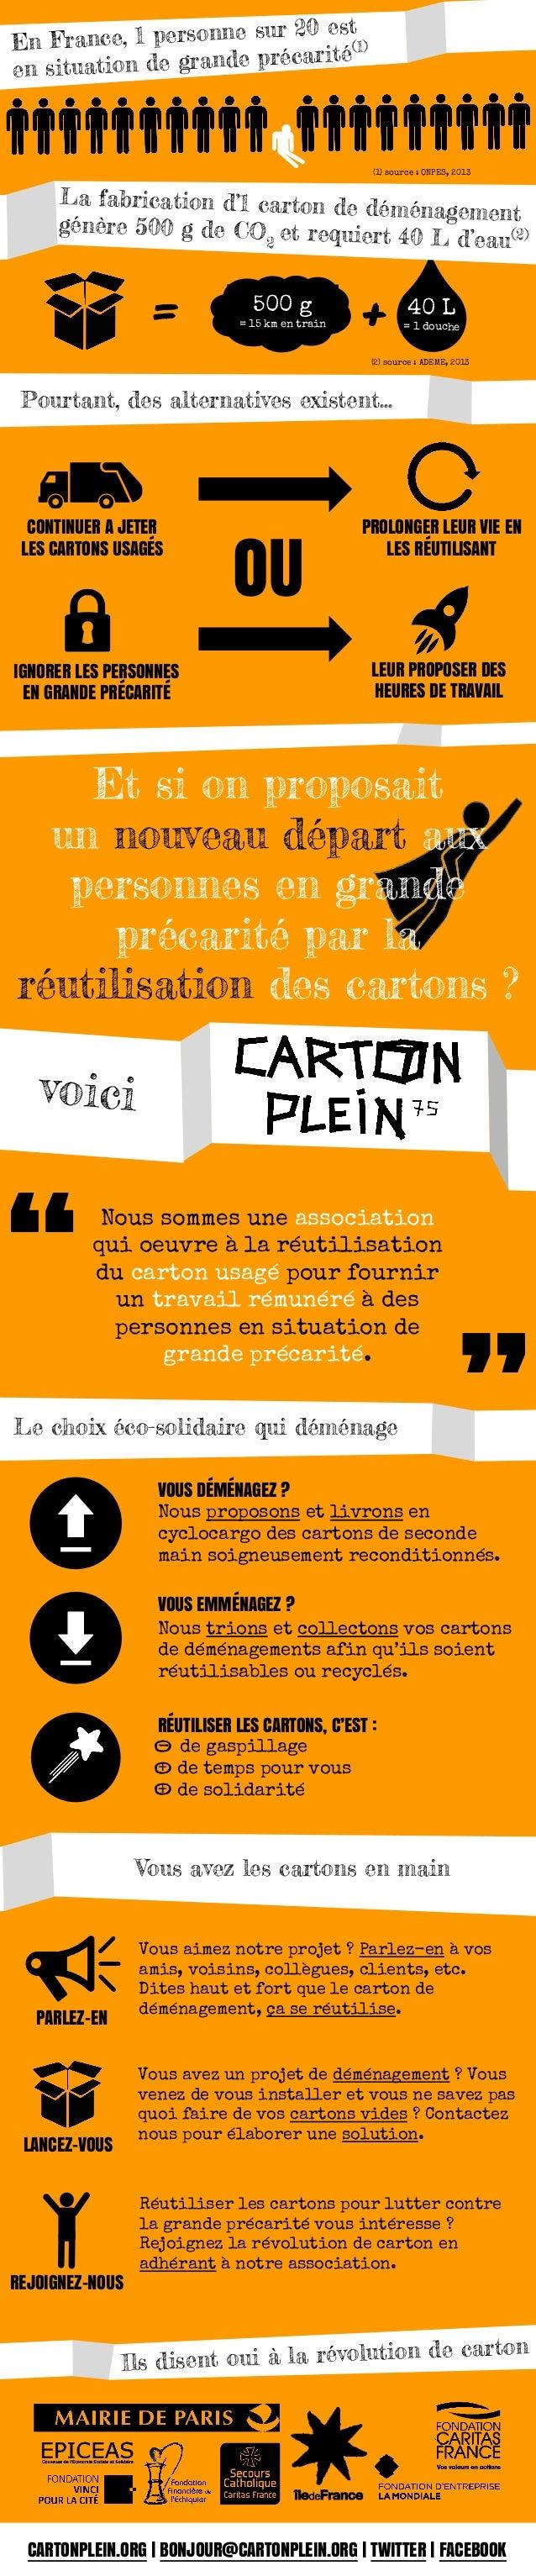 40 L = 1 douche 500 g = 15 km en train += CARTONPLEIN.ORG | BONJOUR@CARTONPLEIN.ORG | TWITTER | FACEBOOK En France, 1 pers...